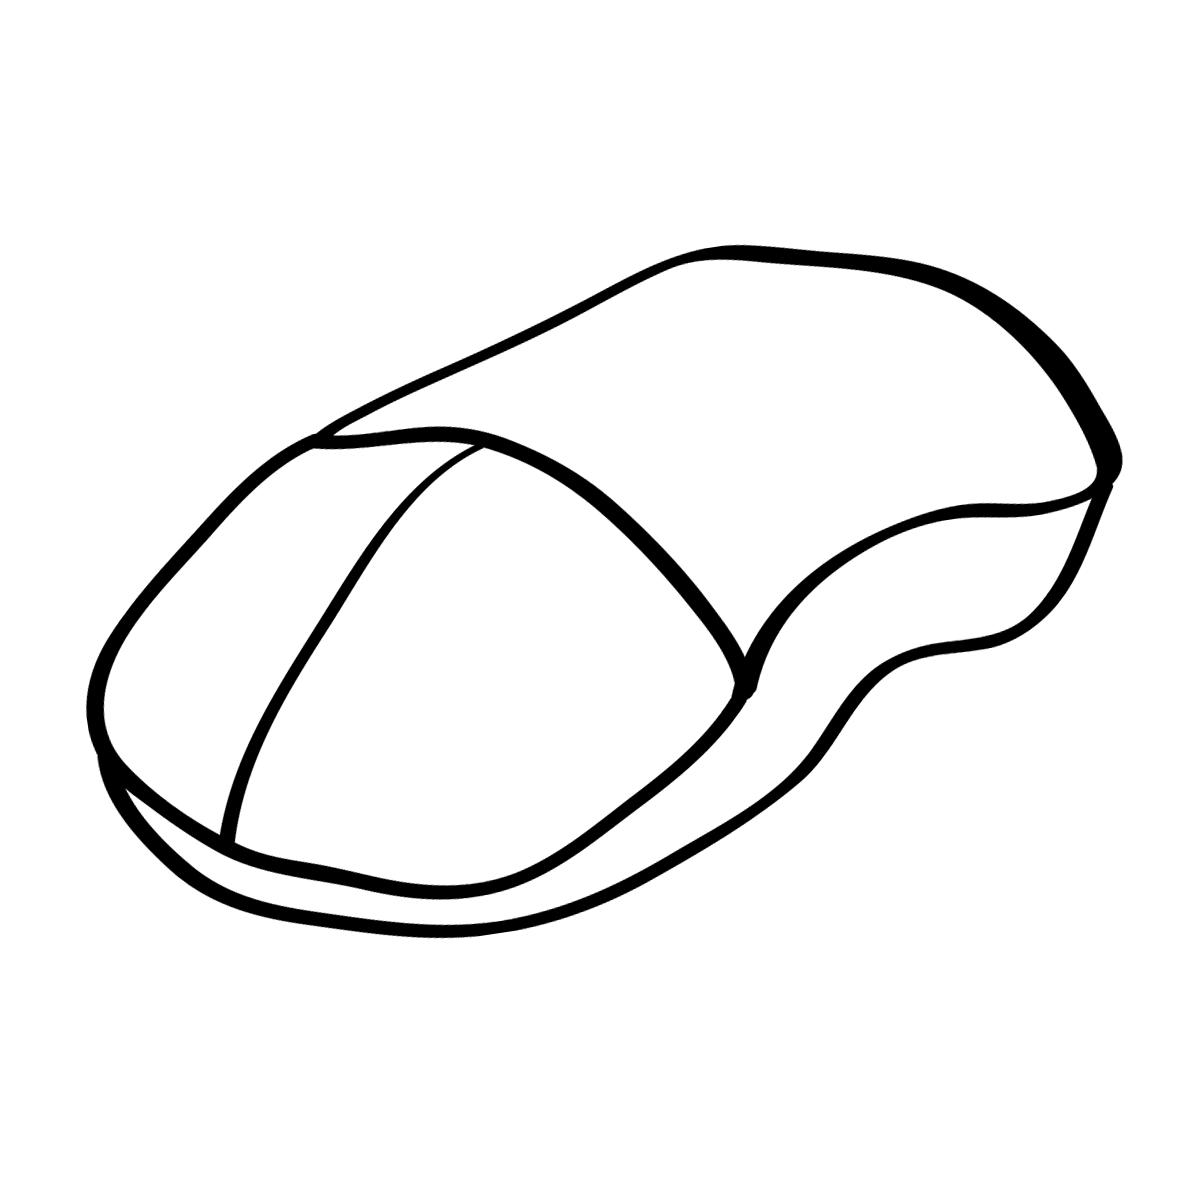 il·lustració d'un ratolí